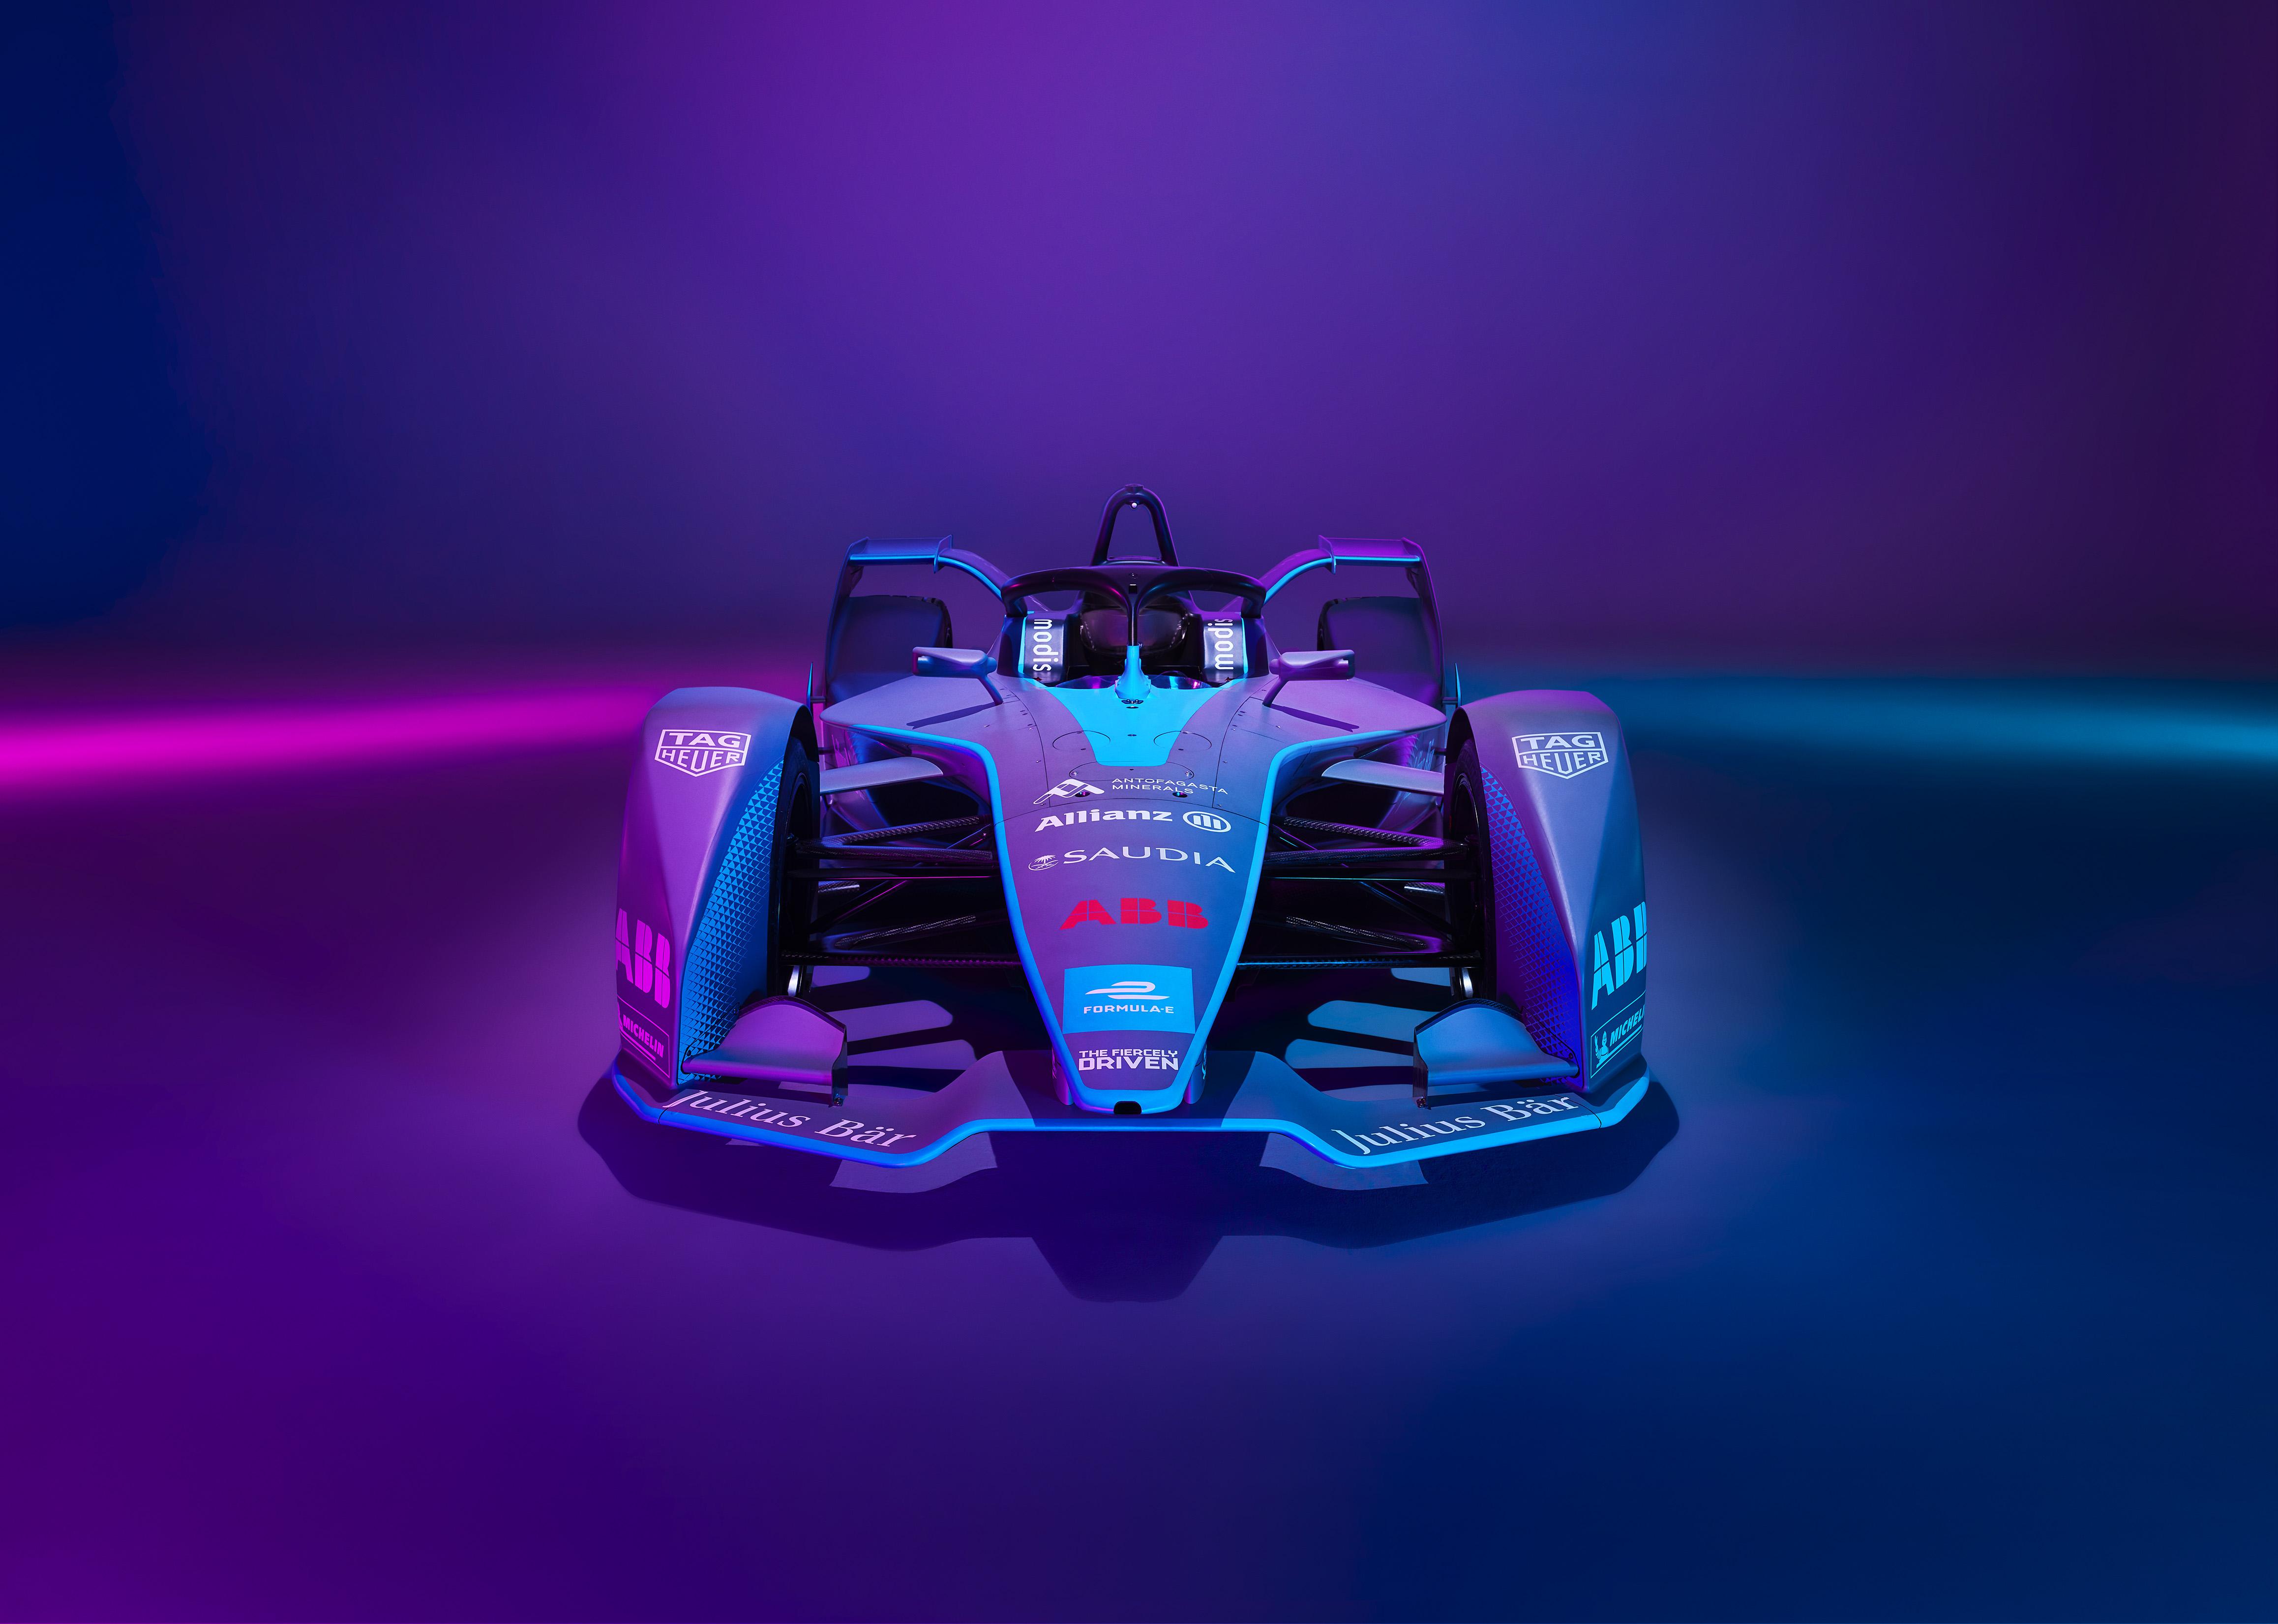 Full Season Entry List For 2018 19 Fia Formula E Championship Confirmed